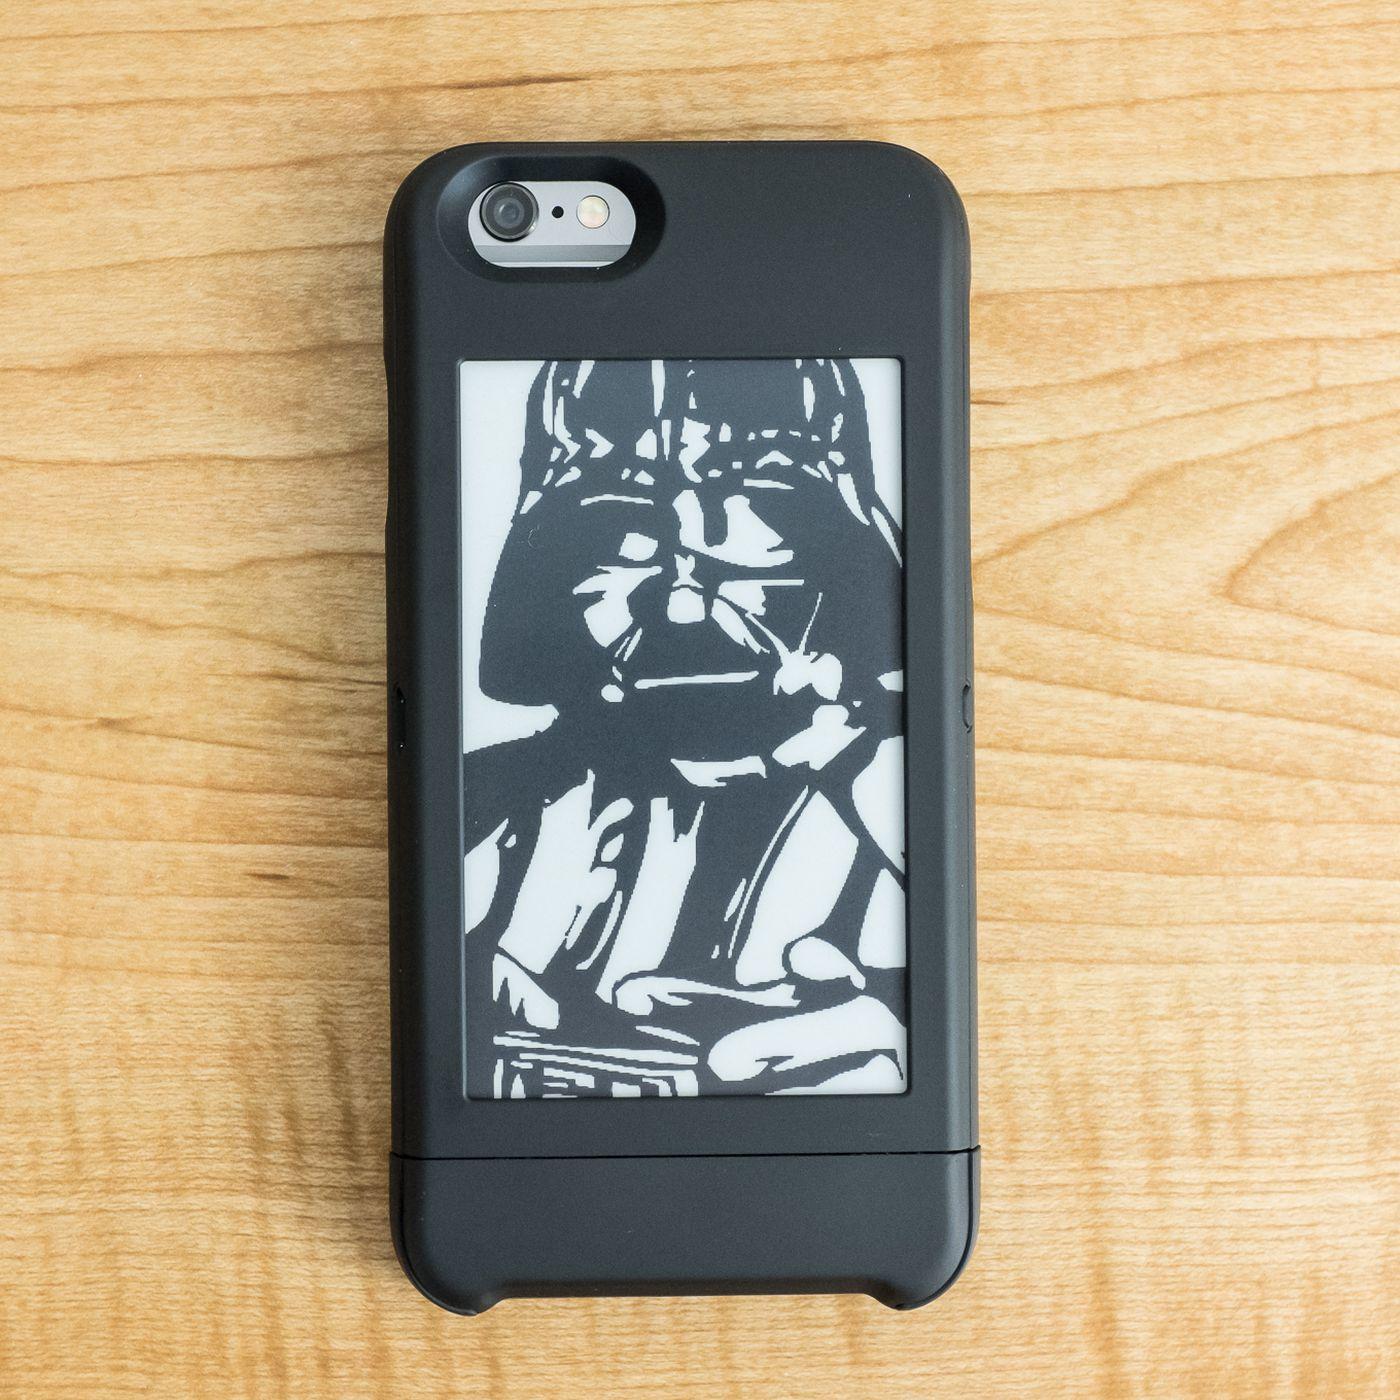 Game of Thrones 18 iphone case